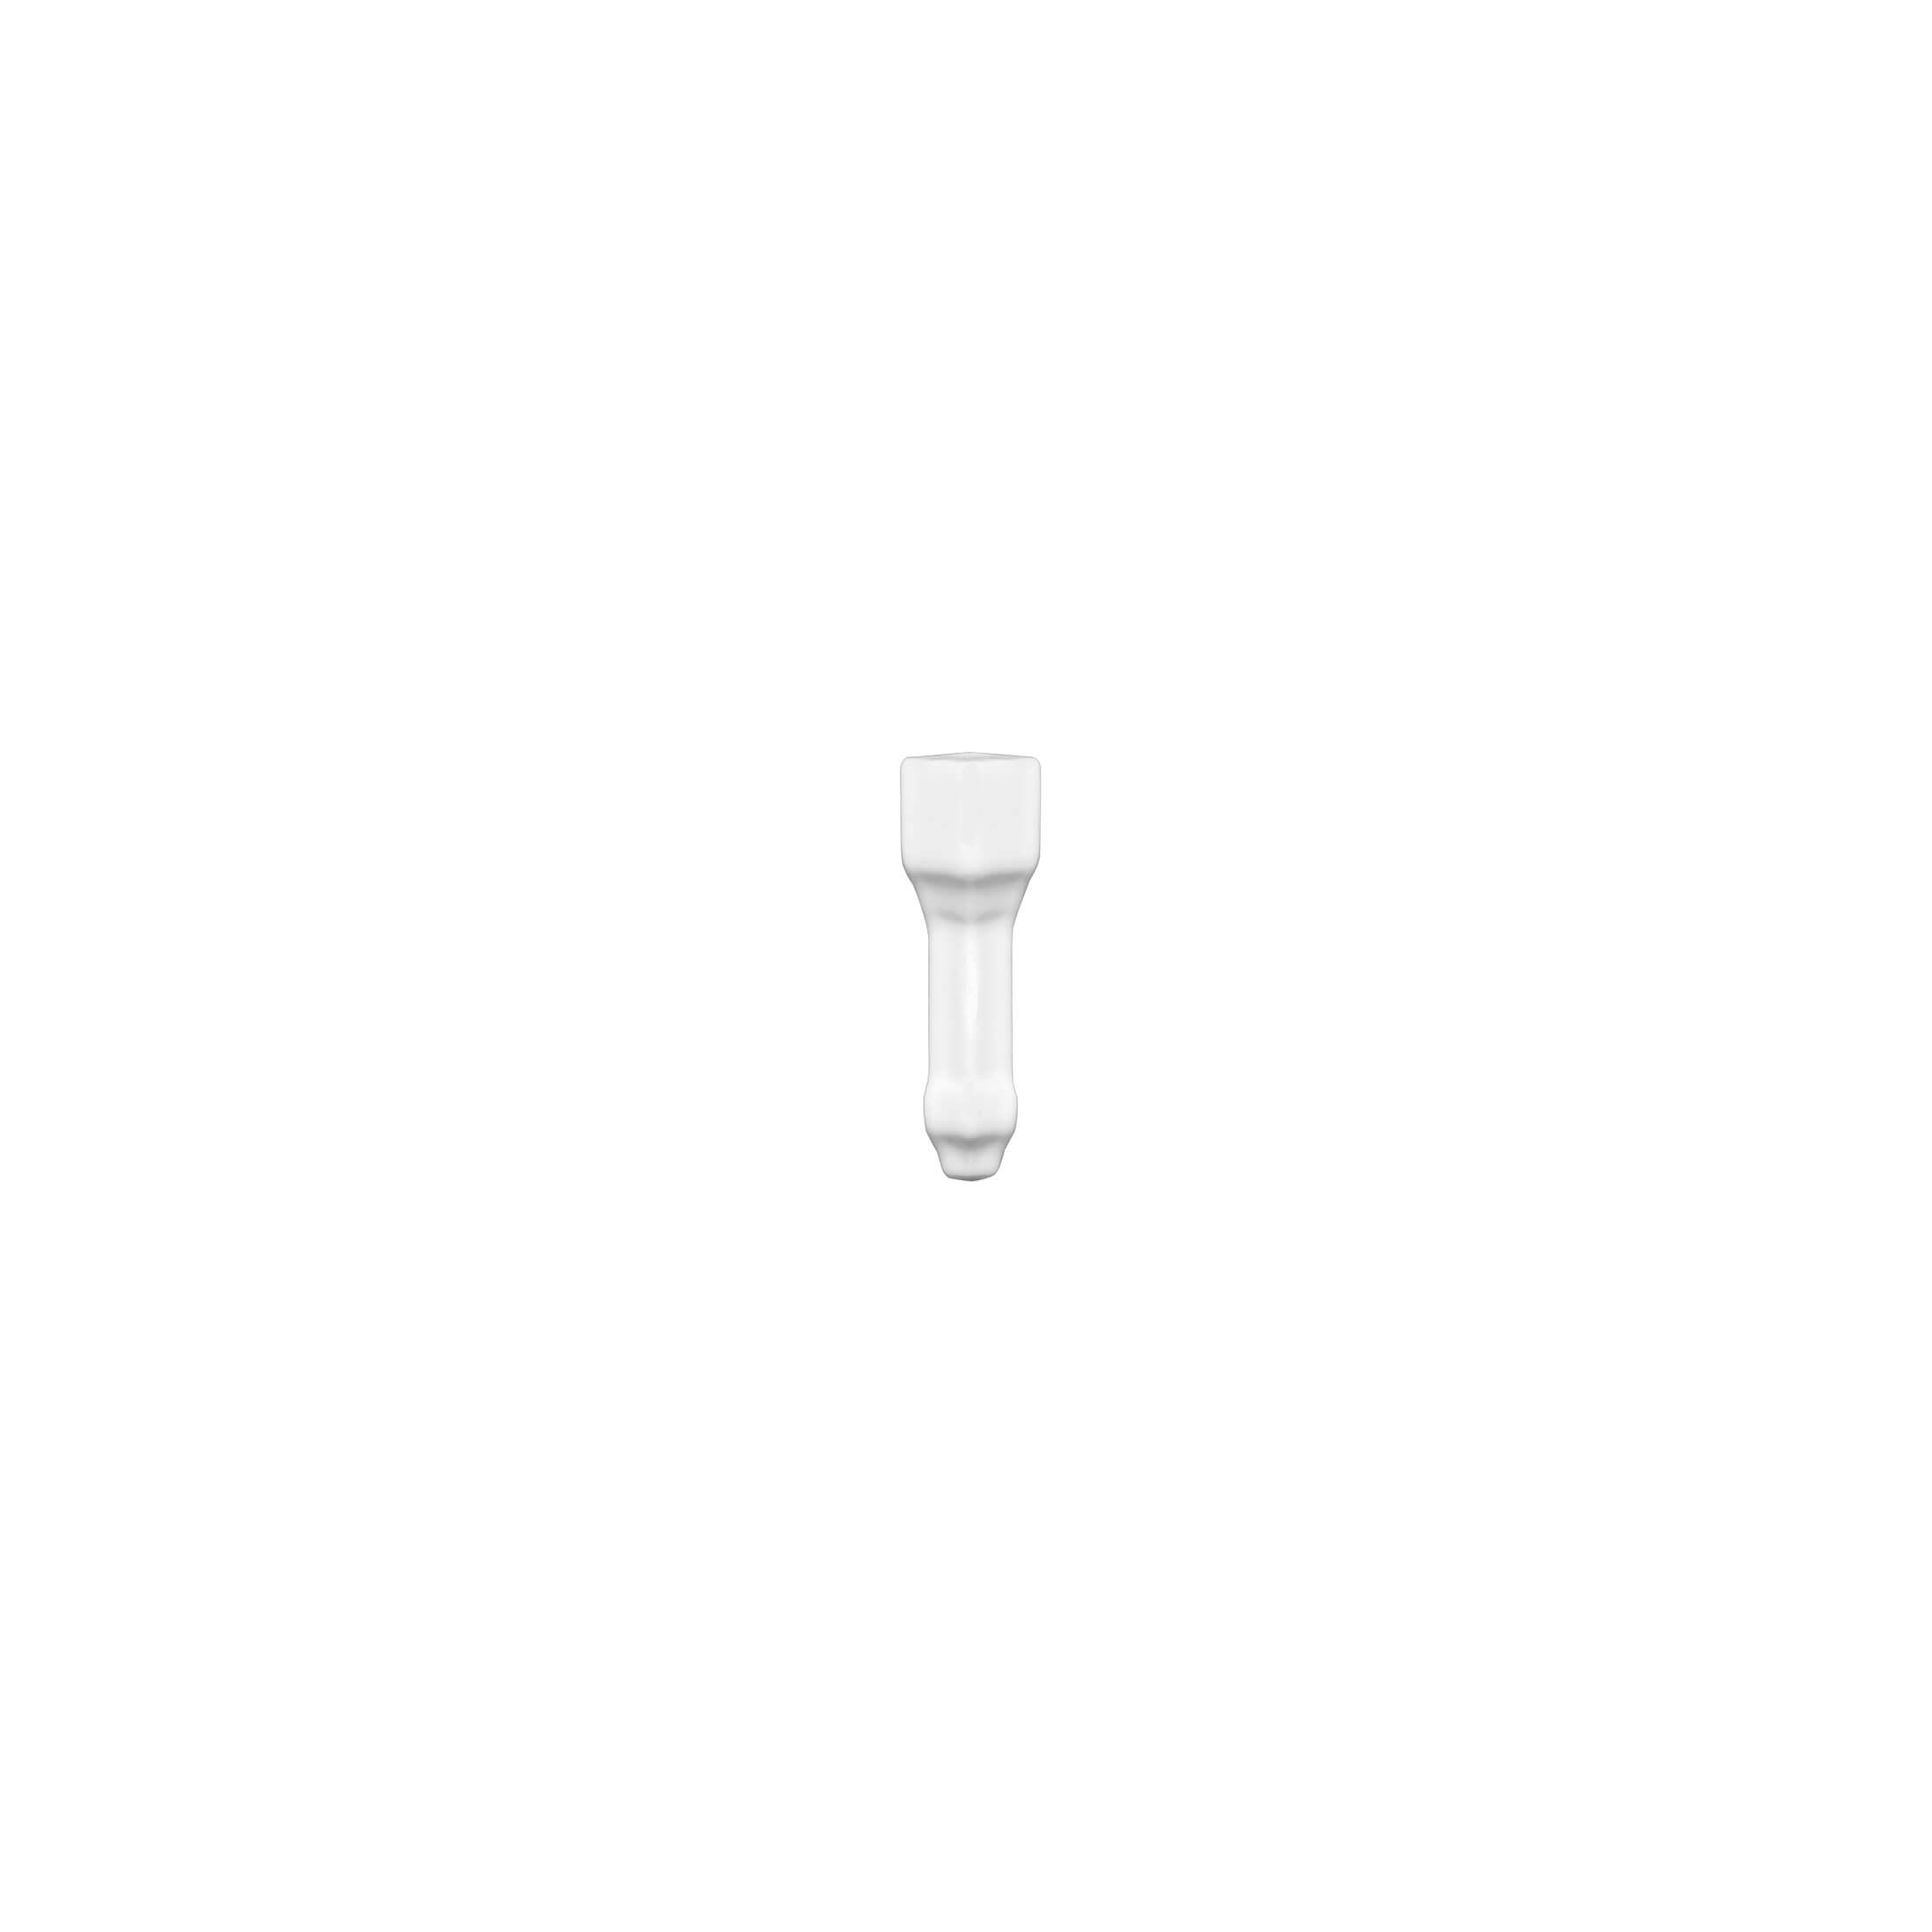 ADCT5039 - ANGULO EXTERIOR CORNISACLASICA - 7 cm X 30 cm